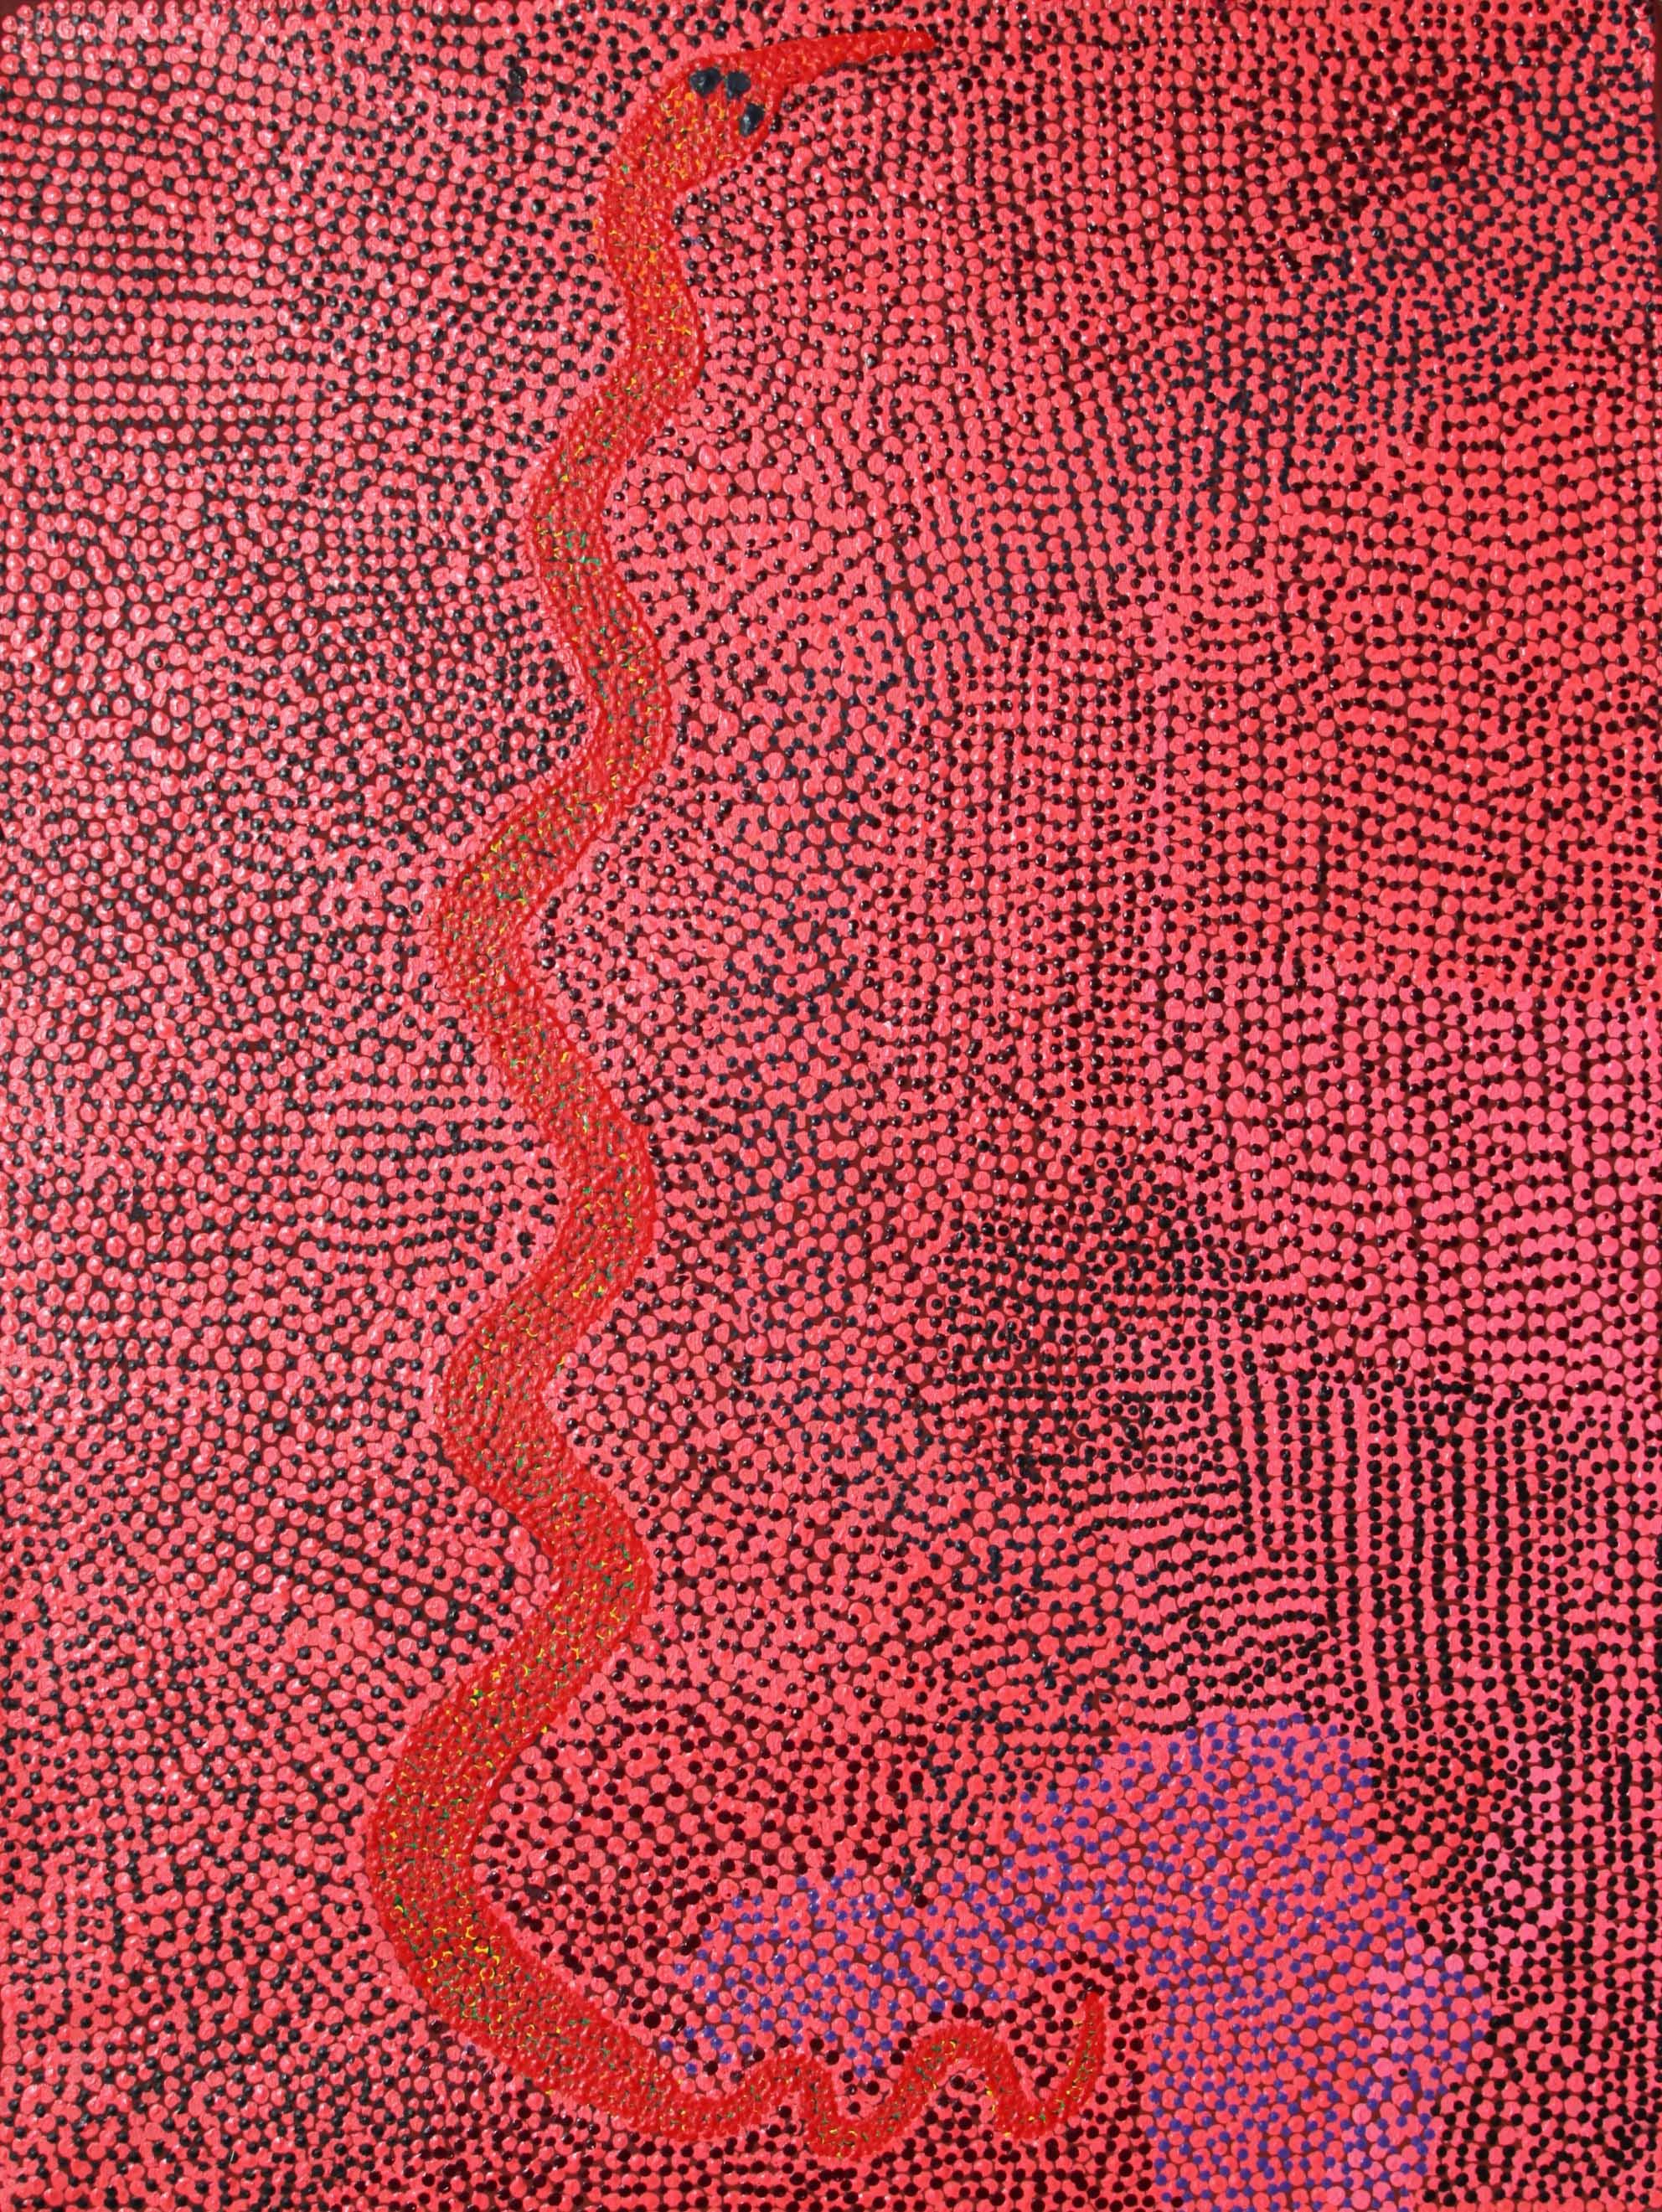 "Nyarrie Morgan  Kanaji Jila  Acrylic on linen 48"" x 36"" (122 x 91 cm) Catalog #13-323   Price Available upon Request"